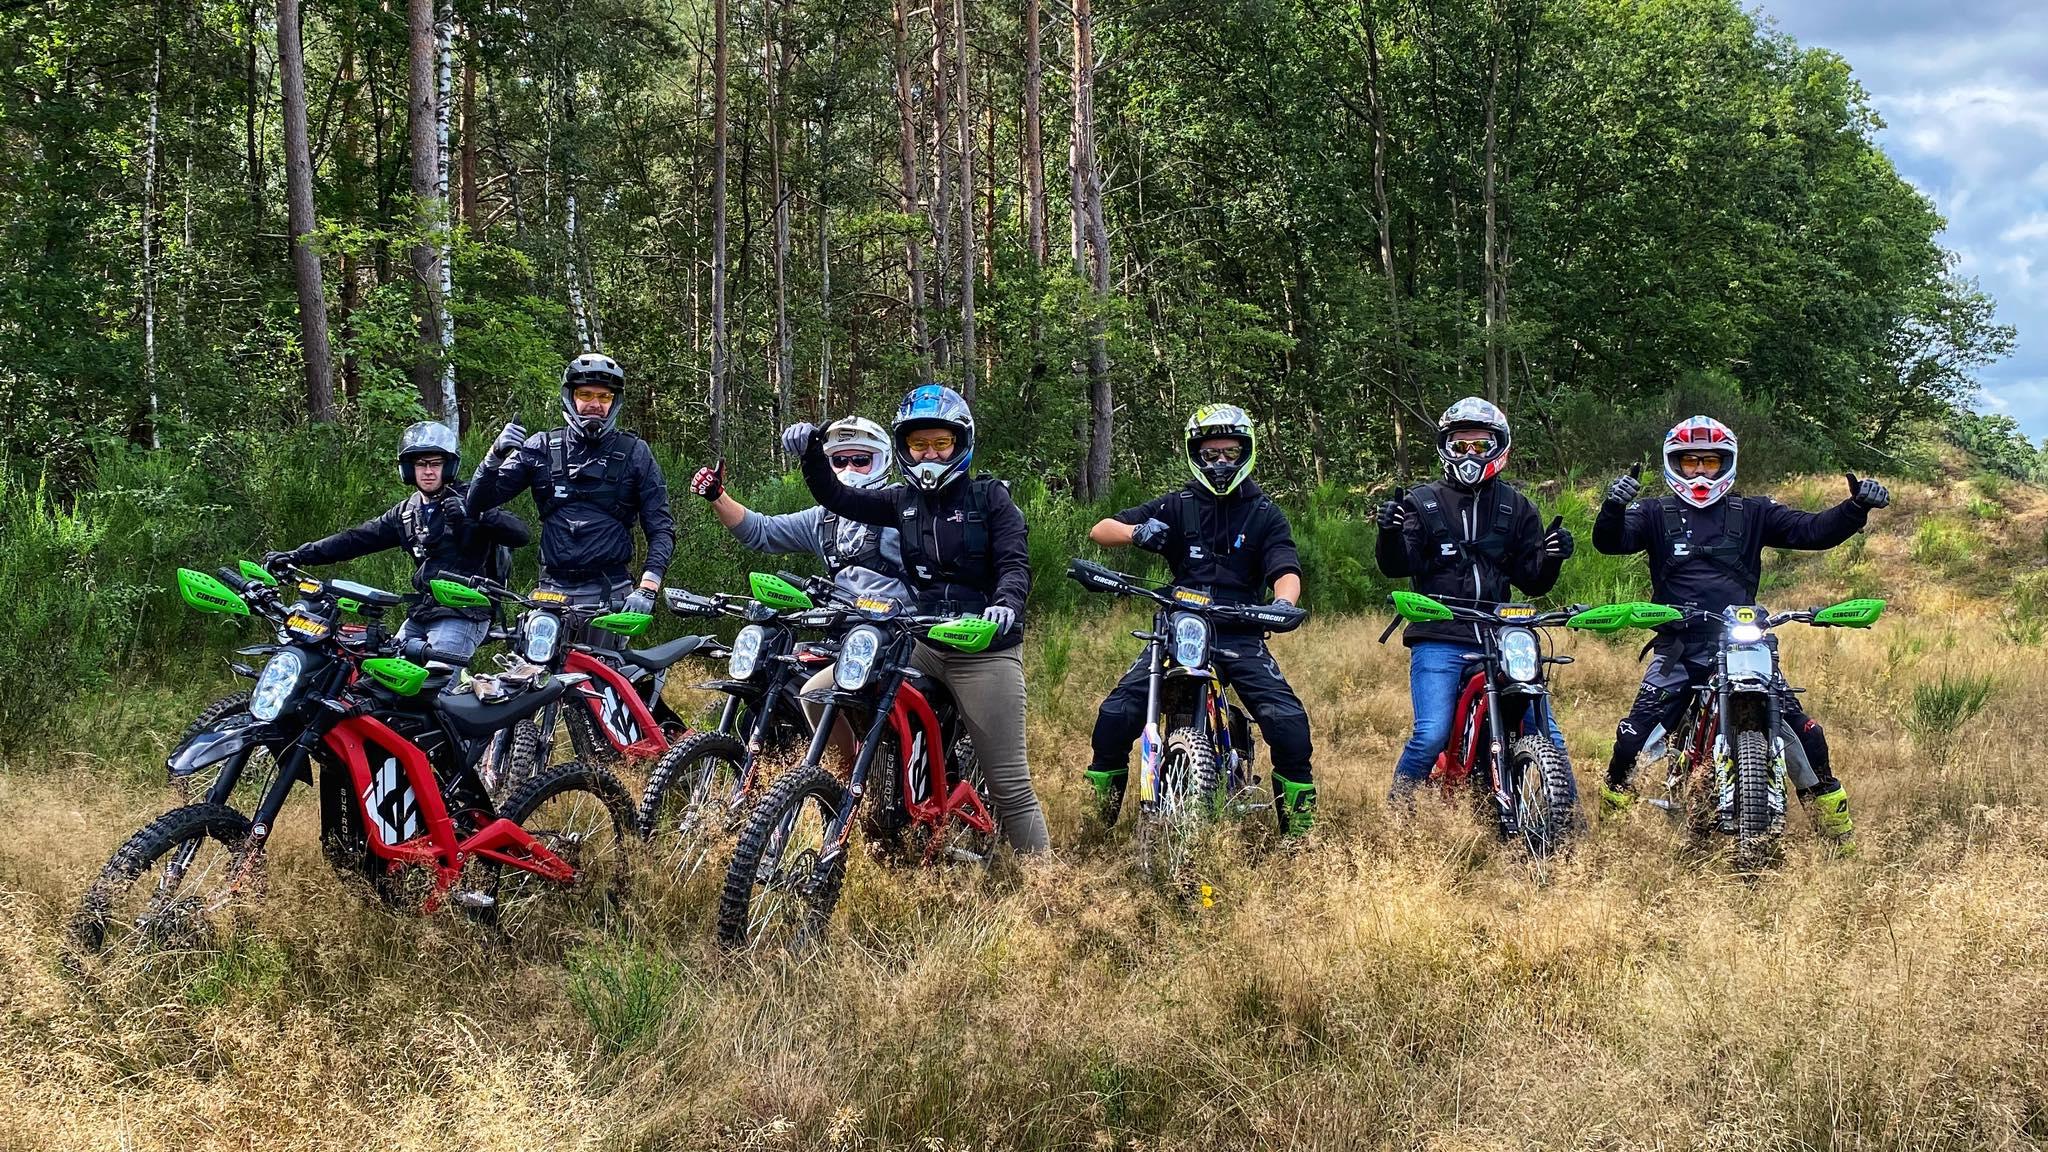 elektirsch offroad rijden E-tour Sur-ron Endurofun 14